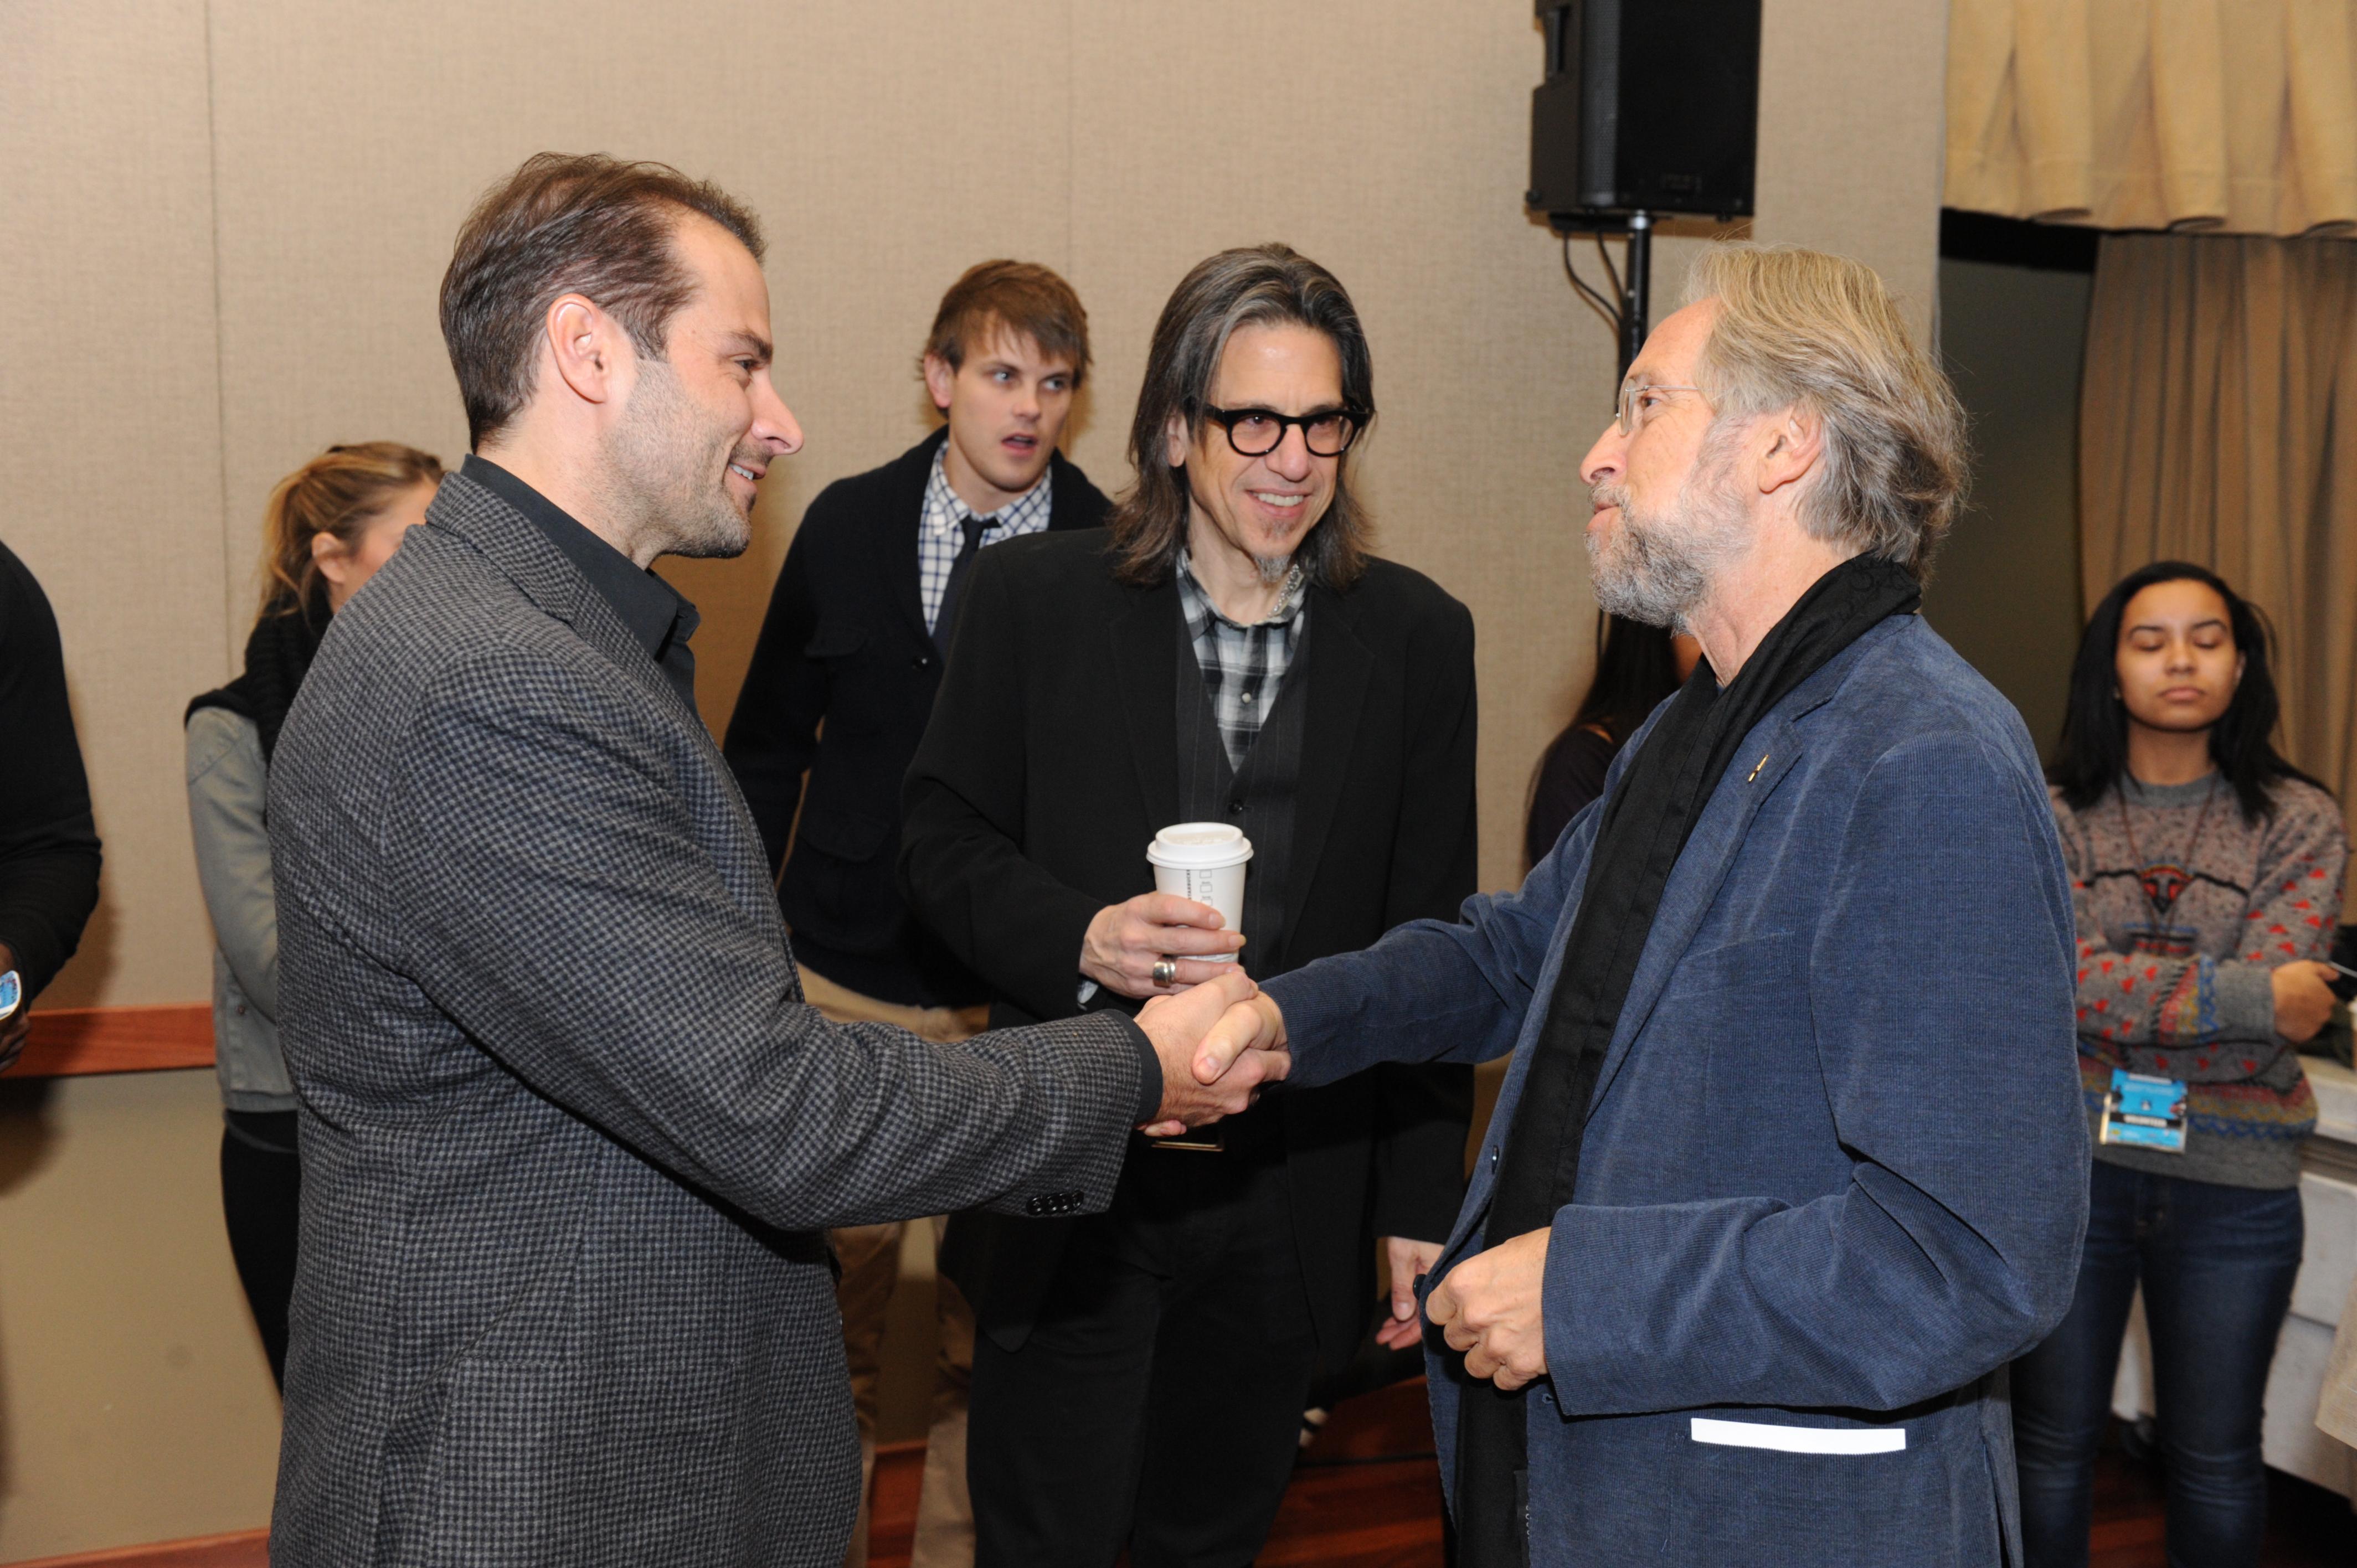 Scott Goldman and Neil Portnow